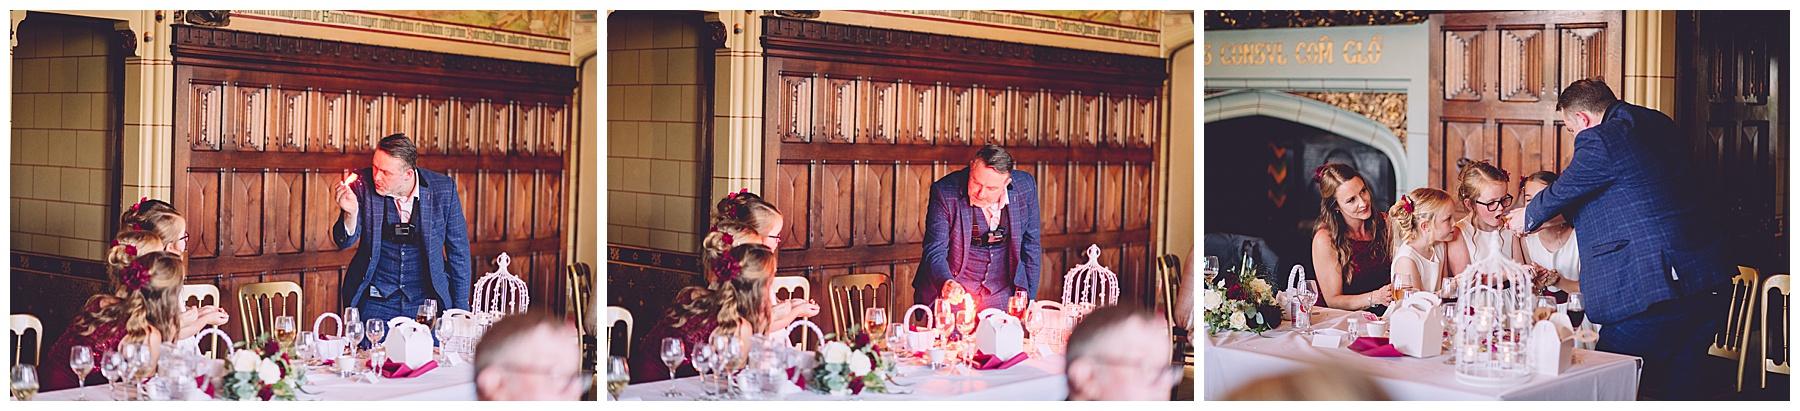 Cardiff Castle Wedding Function